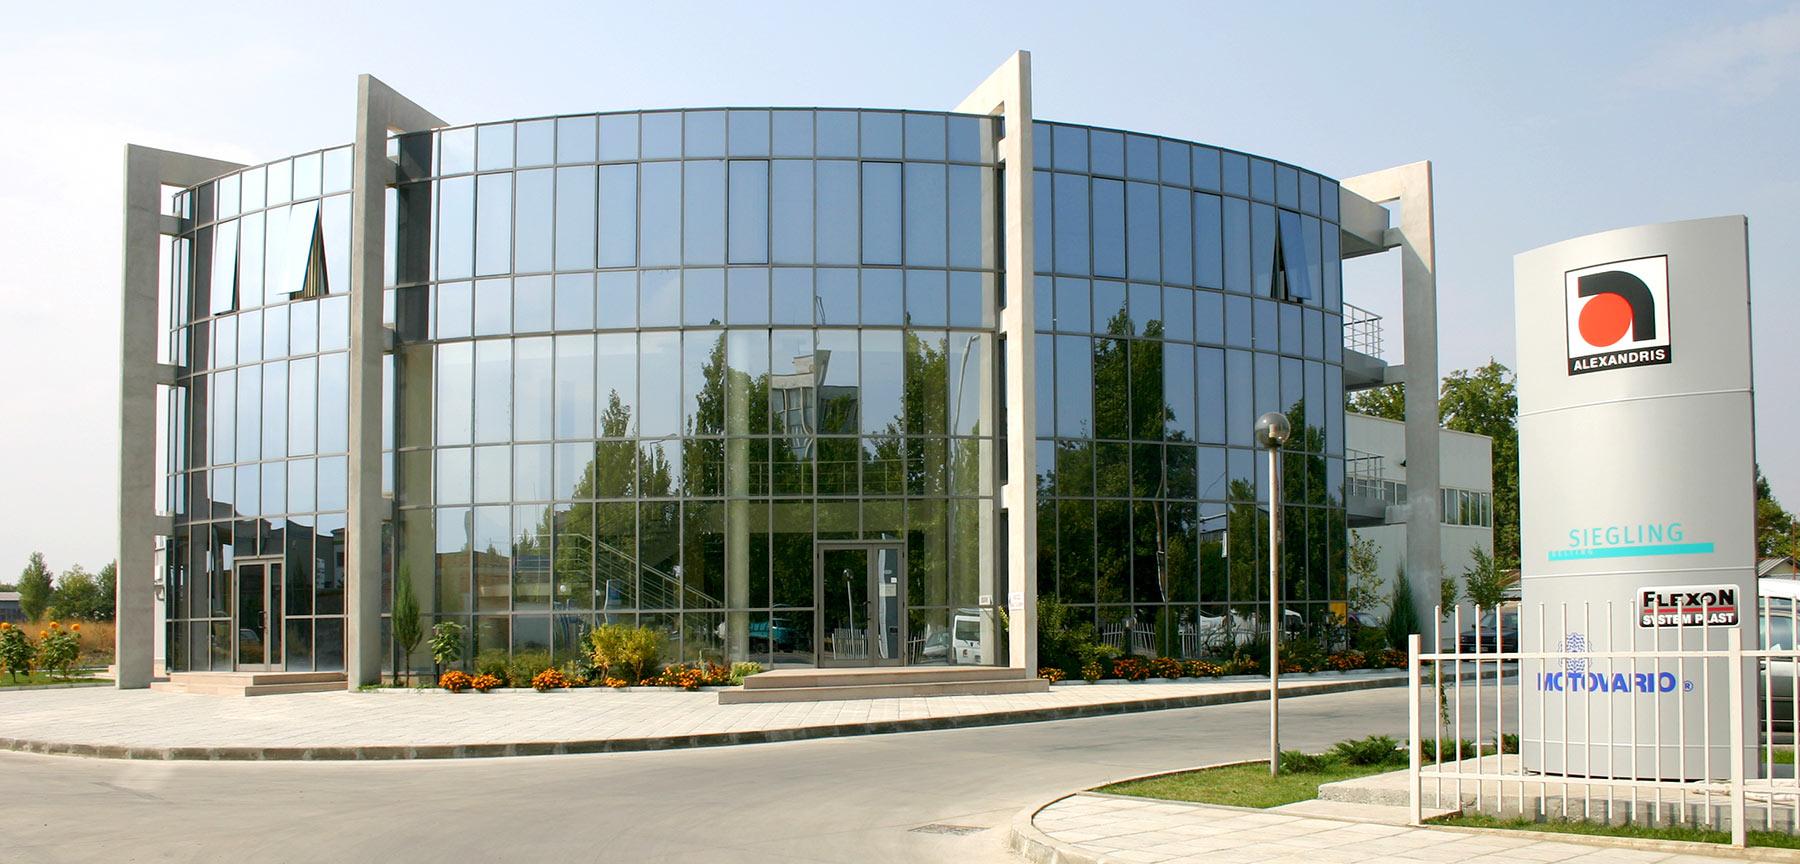 Alexandris Headquarters